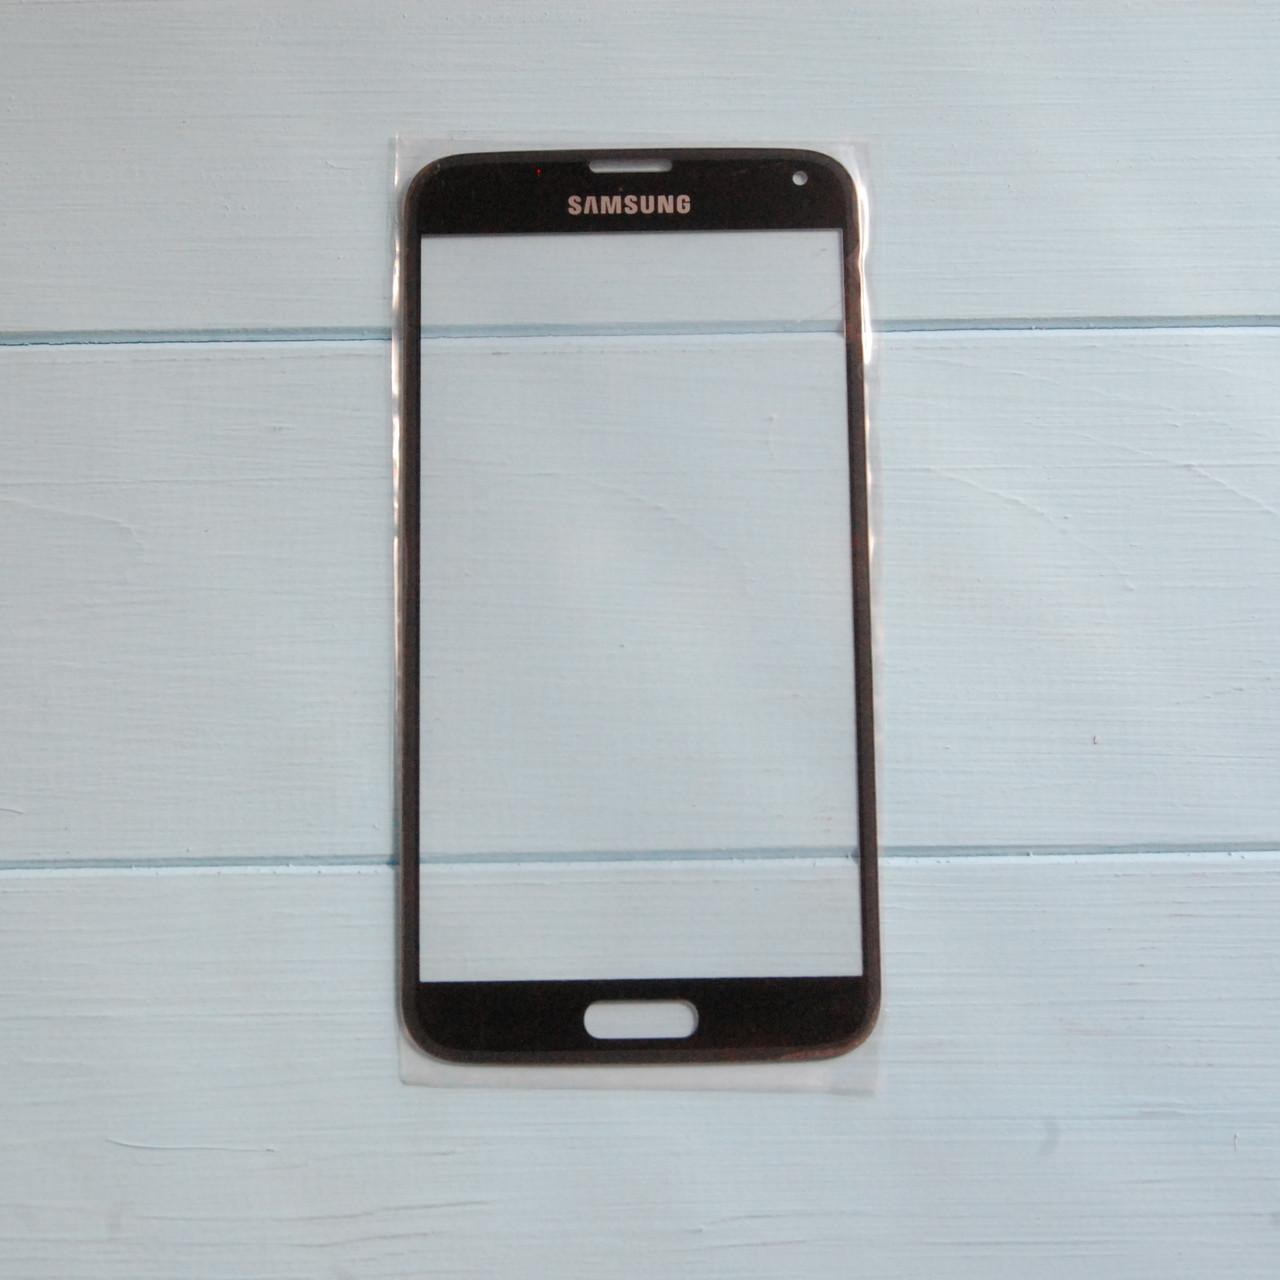 Стекло корпуса для Samsung G900F Galaxy S5, G900H Galaxy S5, G900T Galaxy S5, черное